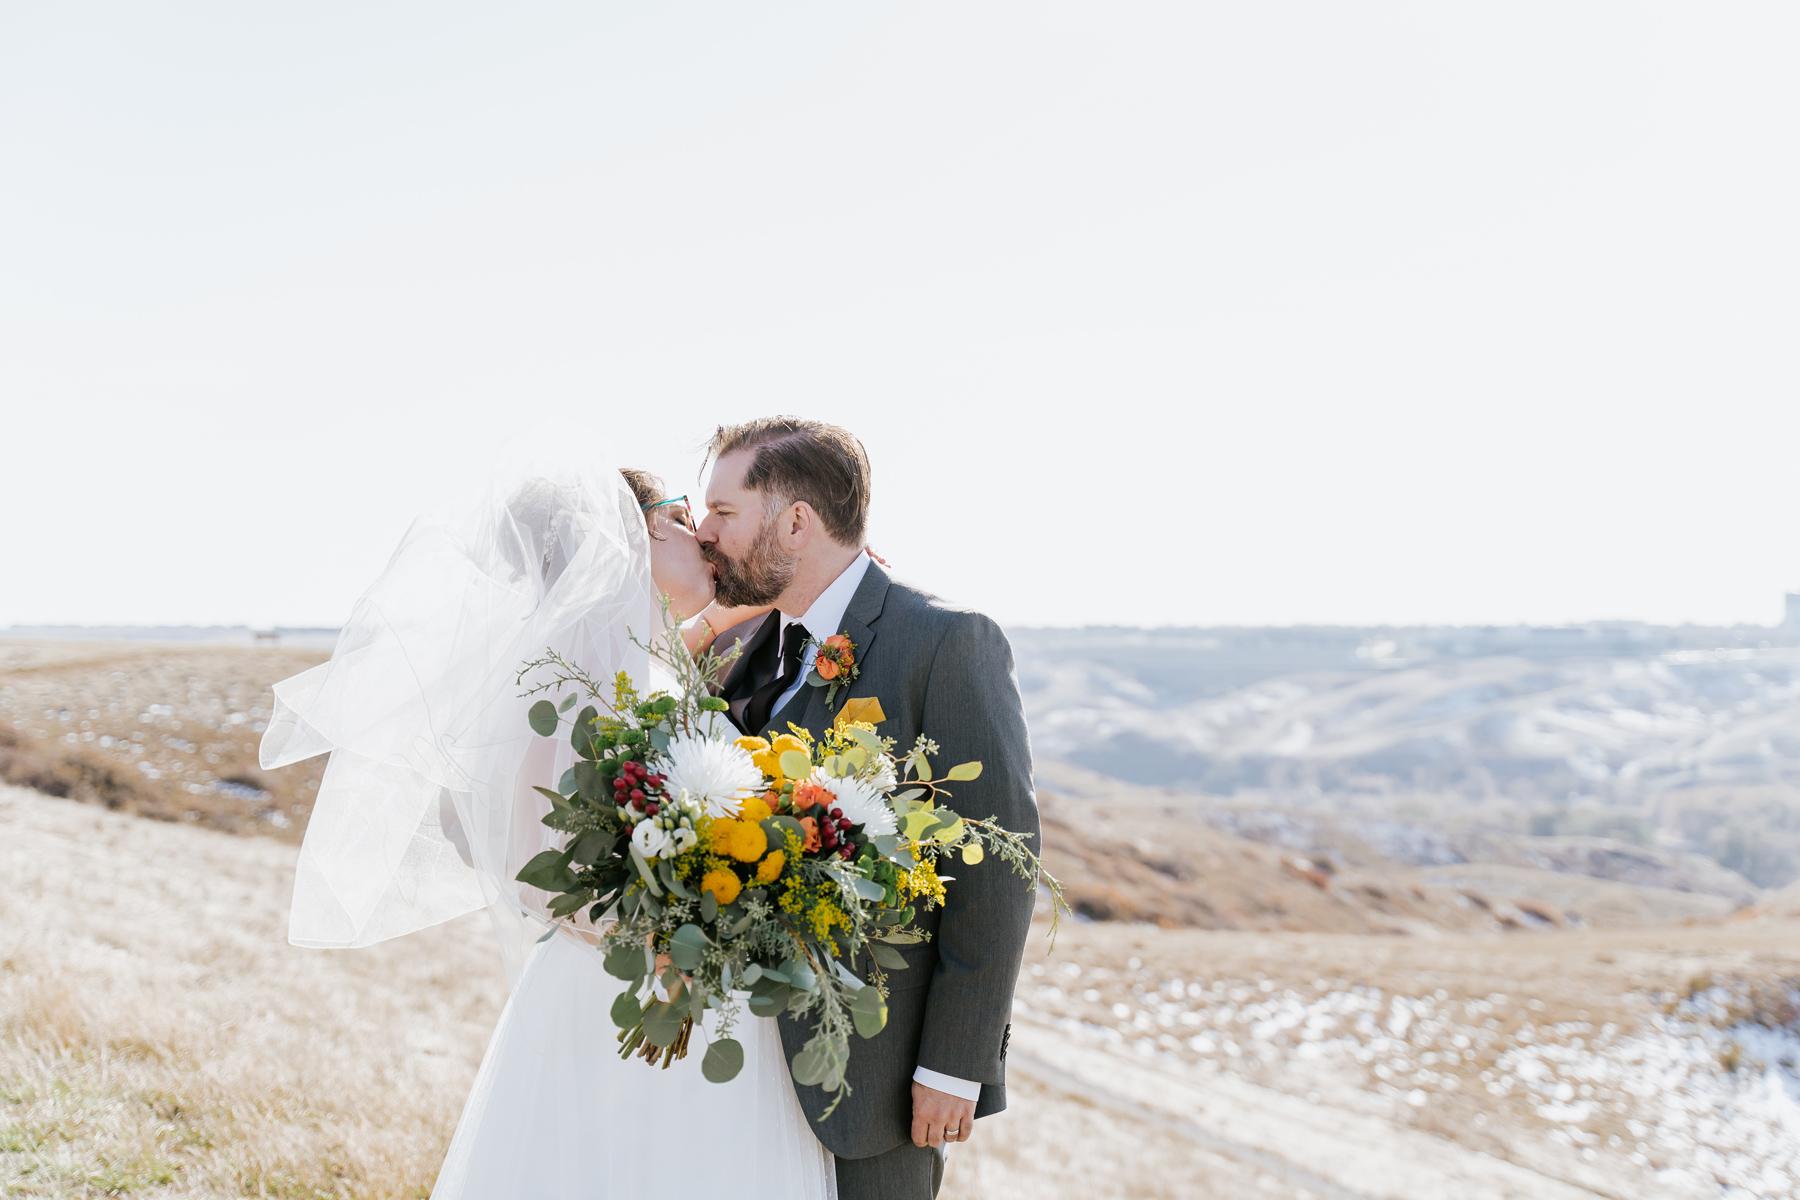 lethbridge-wedding-photography-pd2019-43